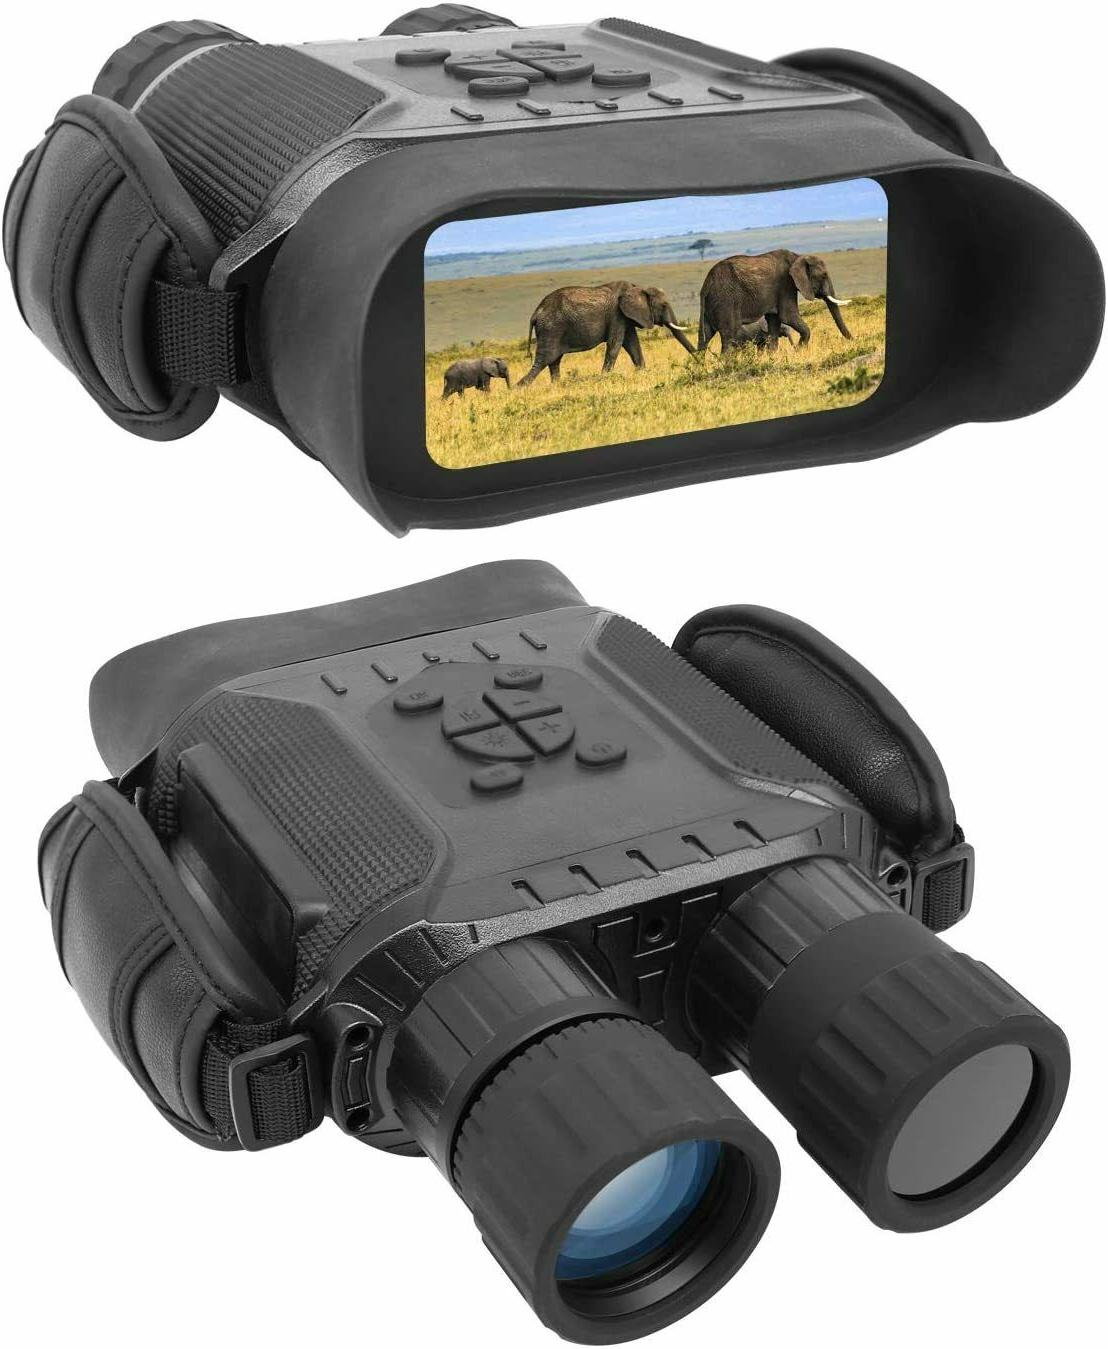 4 5x40mm digital night vision binocular